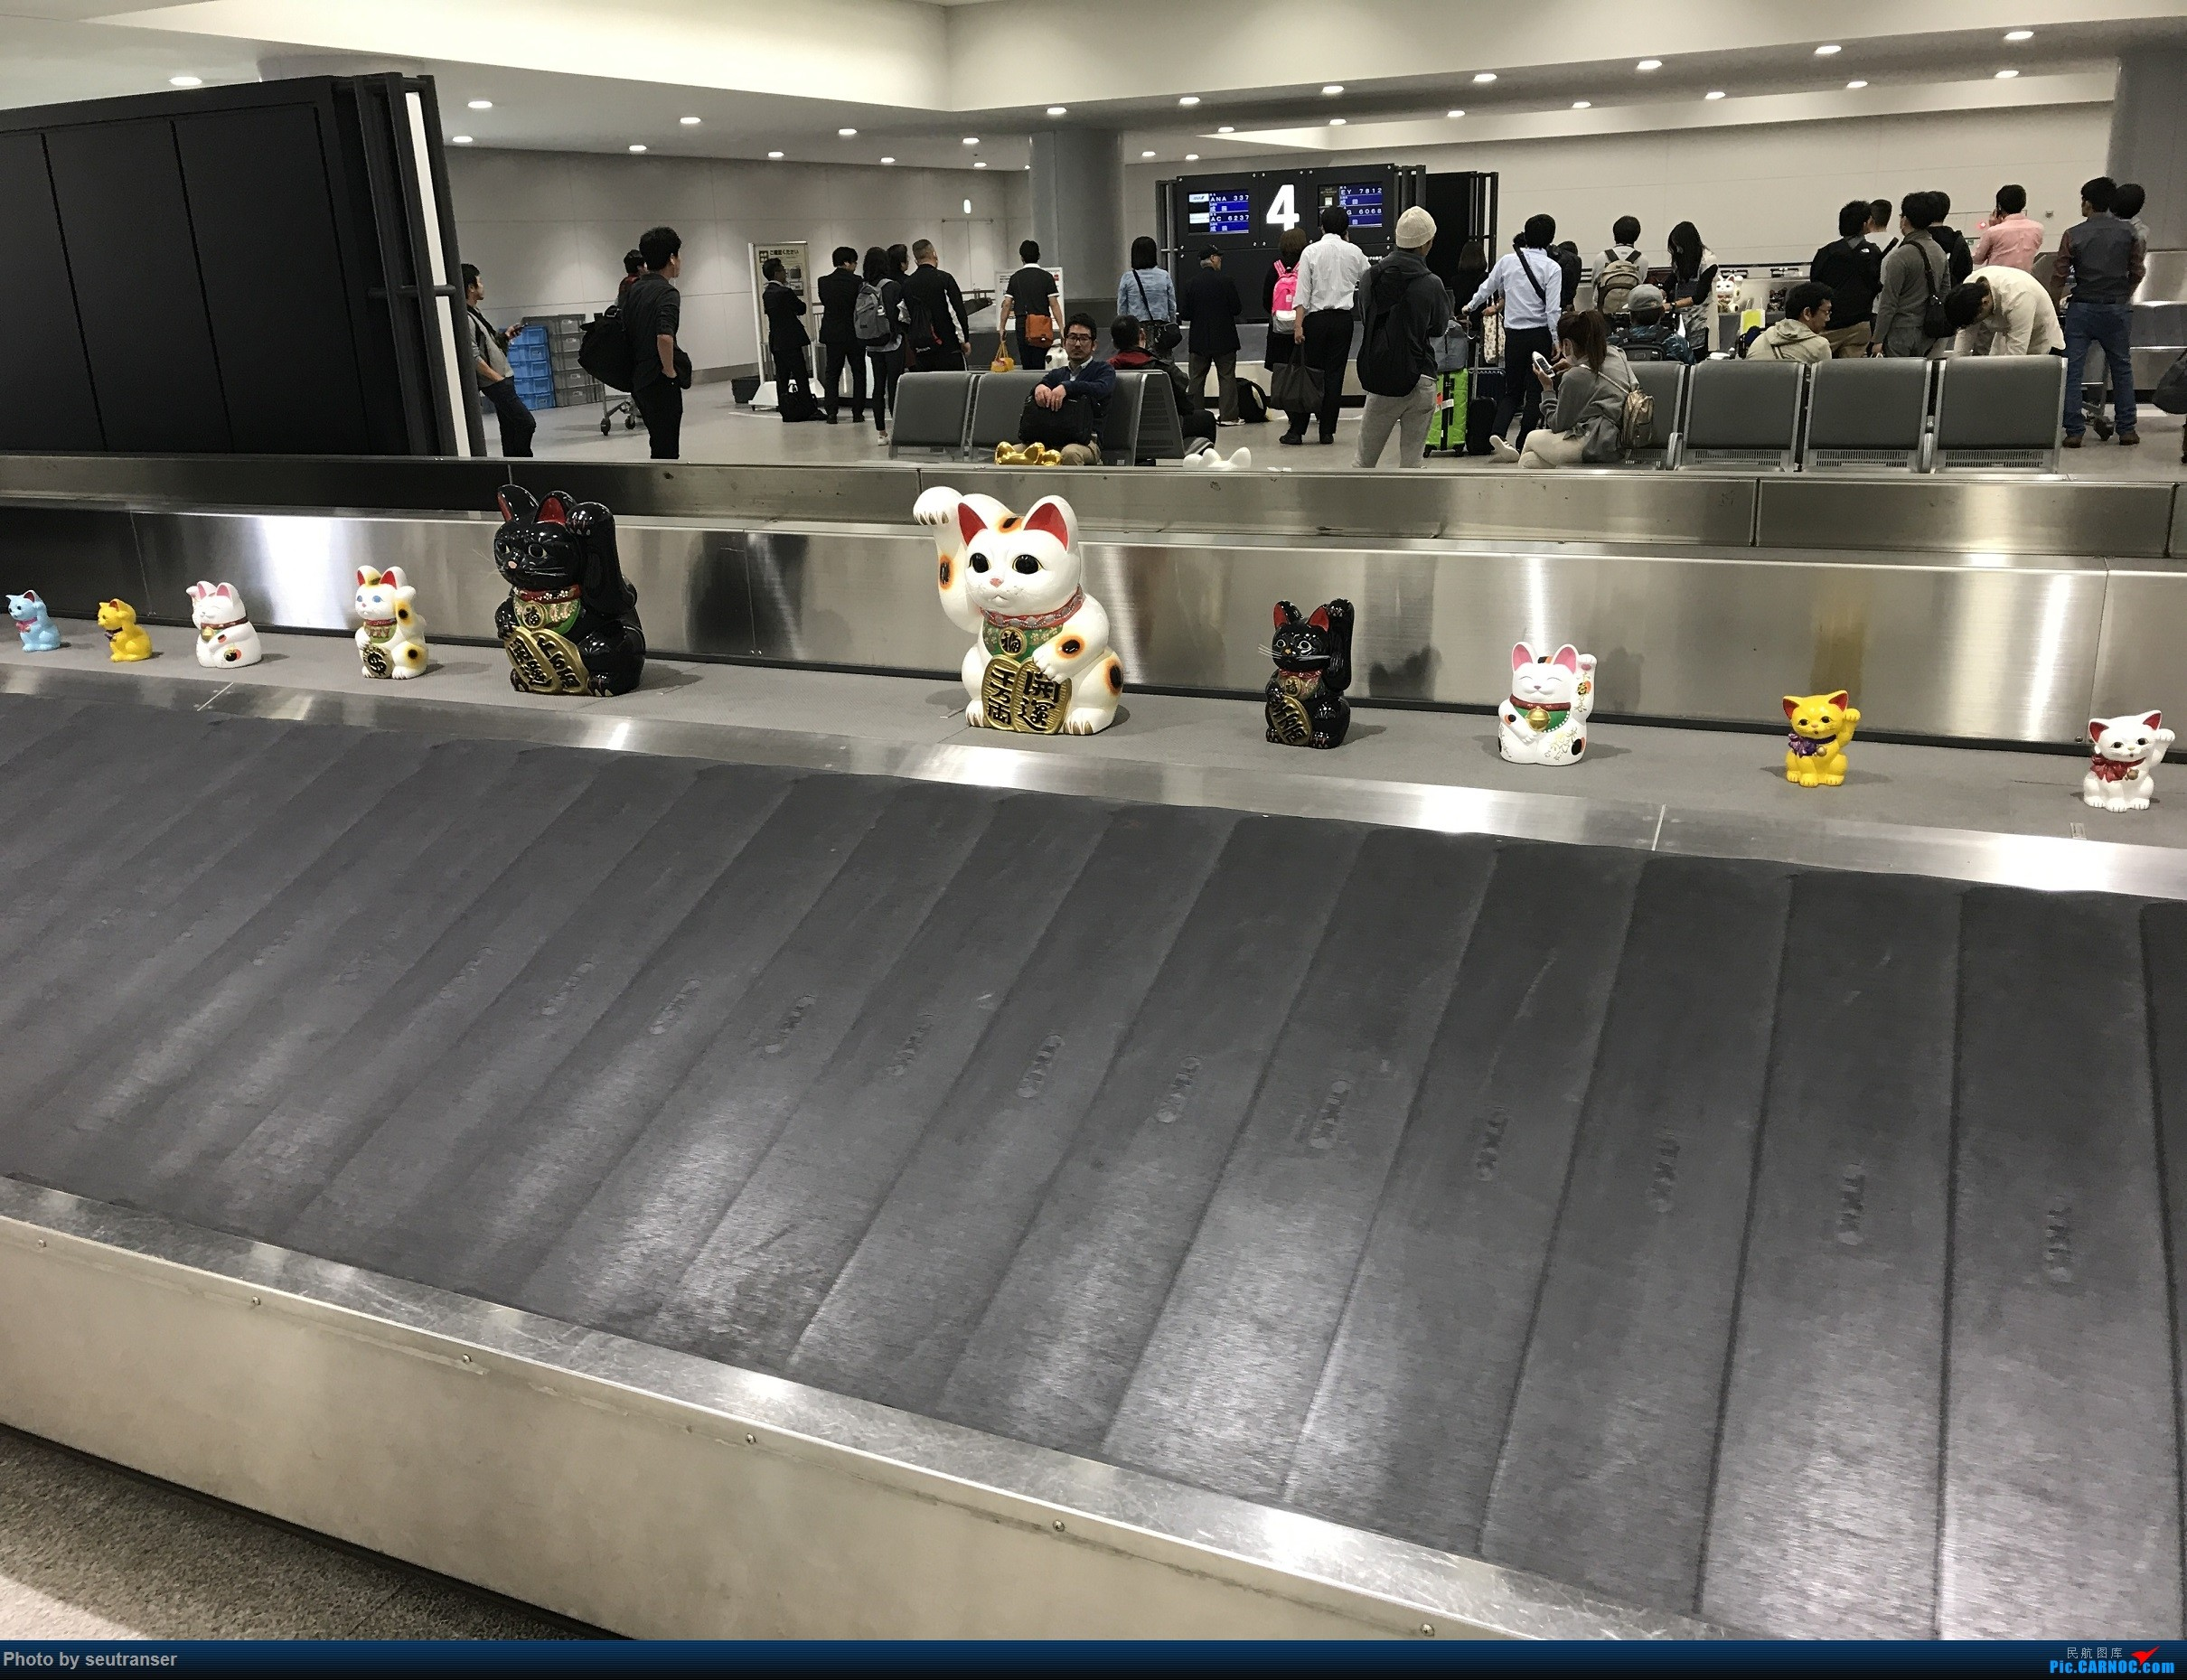 Re:[原创]迟到一年的游记,记第一次出国游 日本10天东航往返+ANA国内线+羽田机场拍机    日本名古屋中部/新特丽亚机场